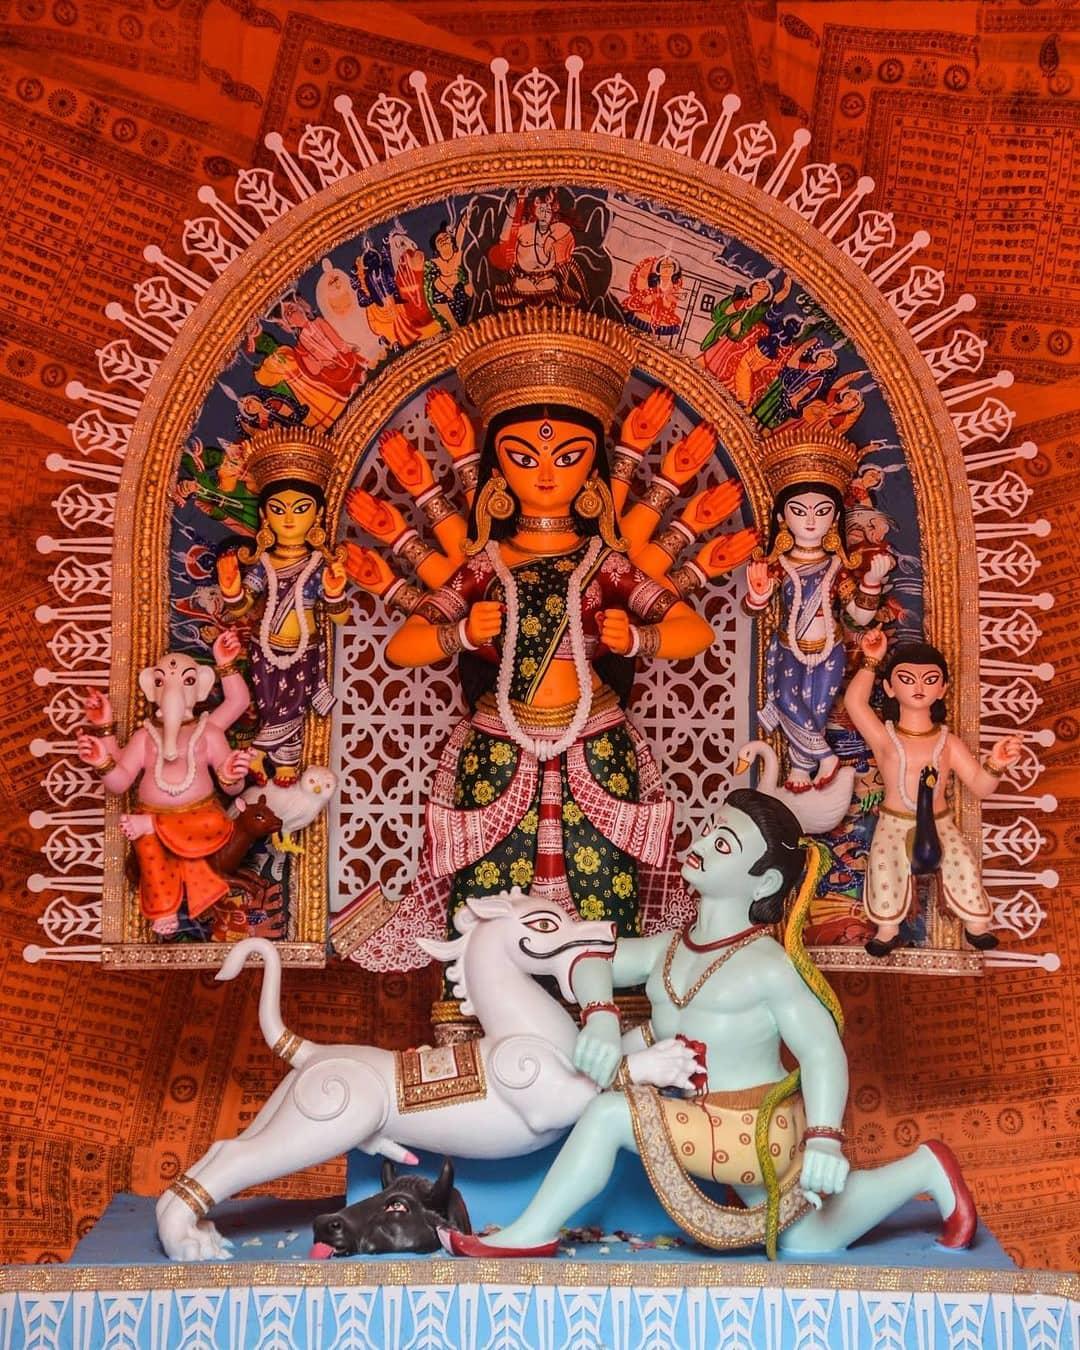 Maa Durga Murti Wallpaper Hd Quality